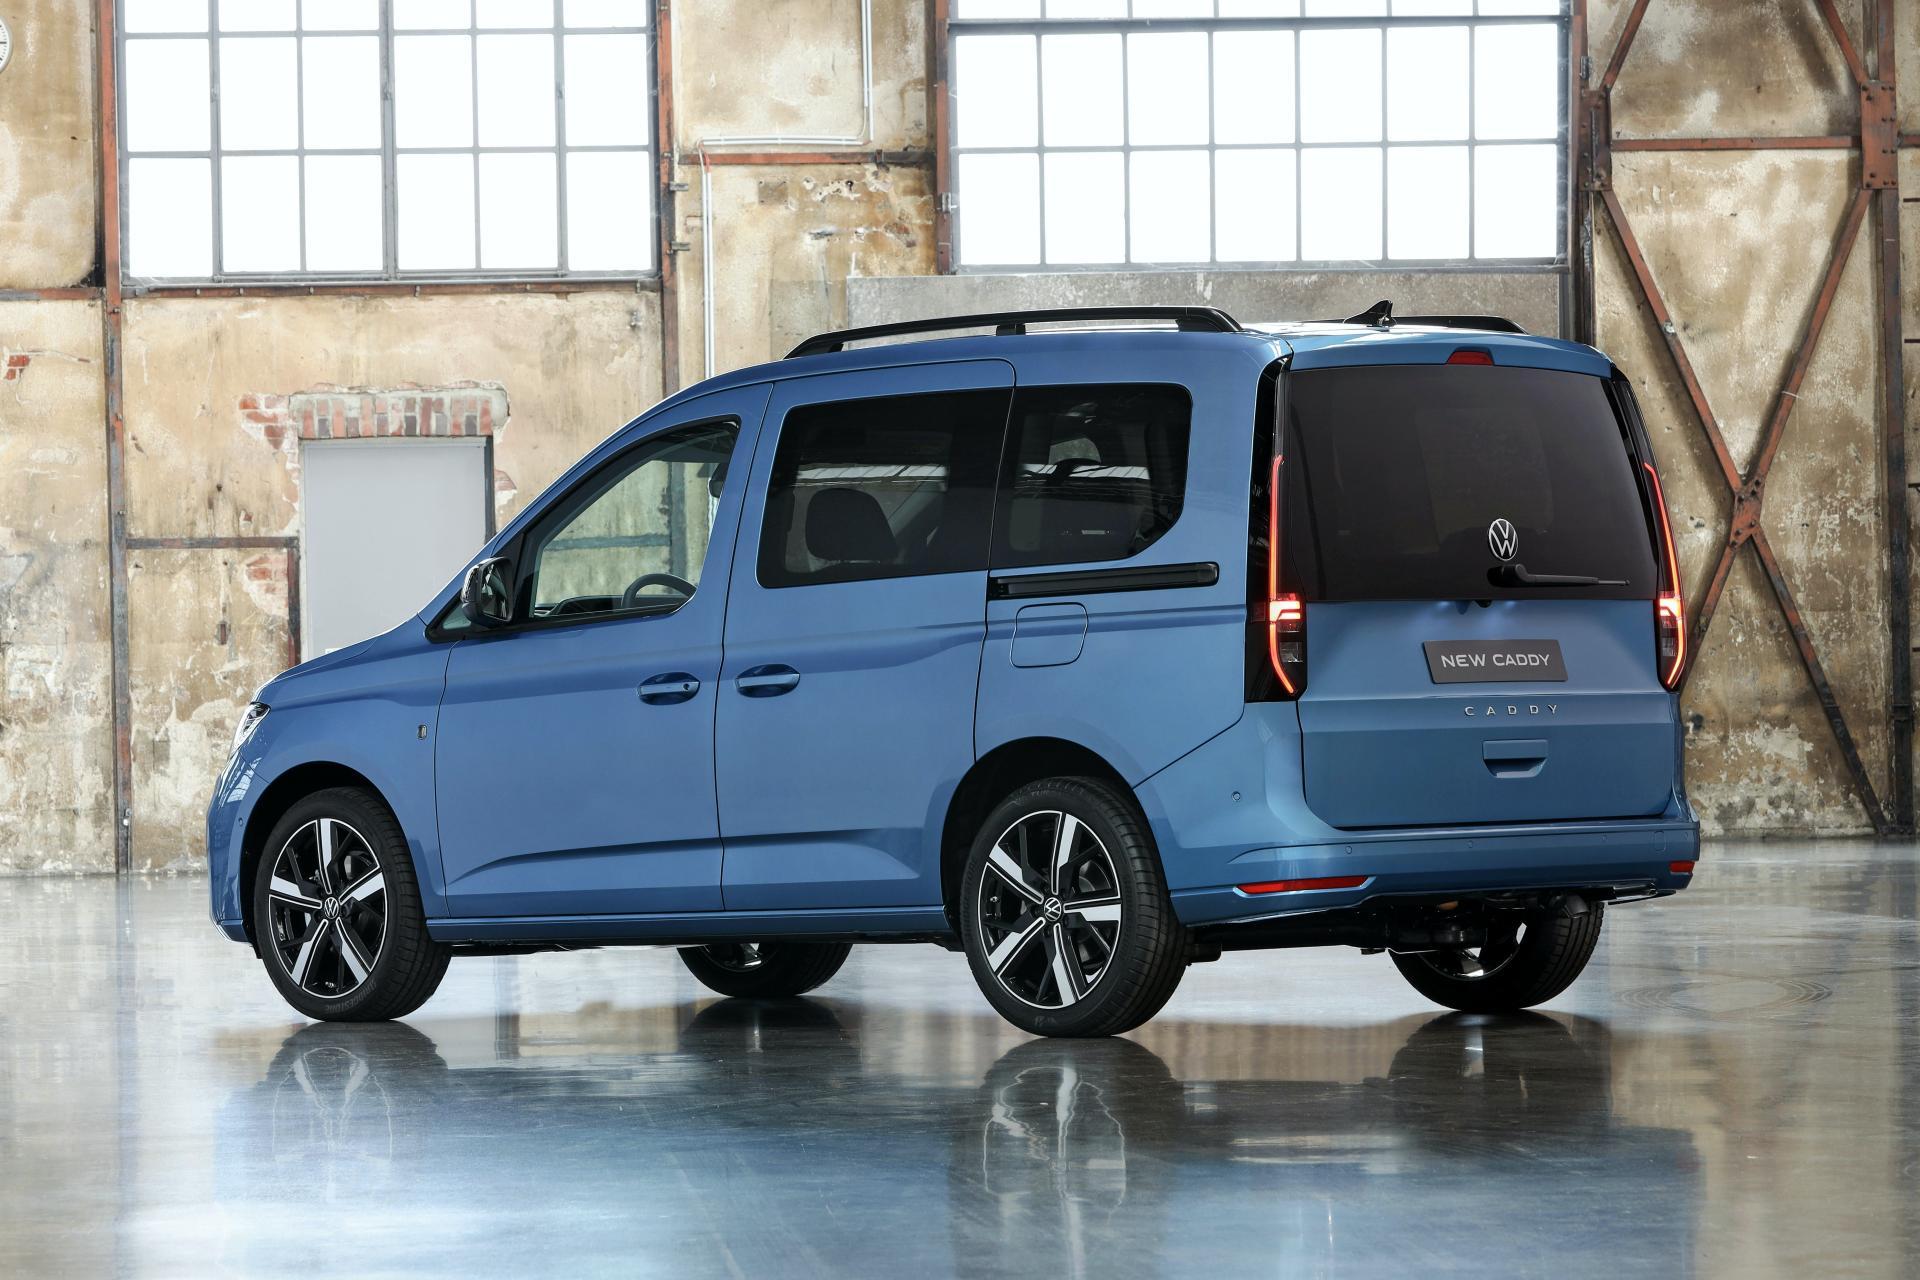 volkswagen confirms plans to build microbus